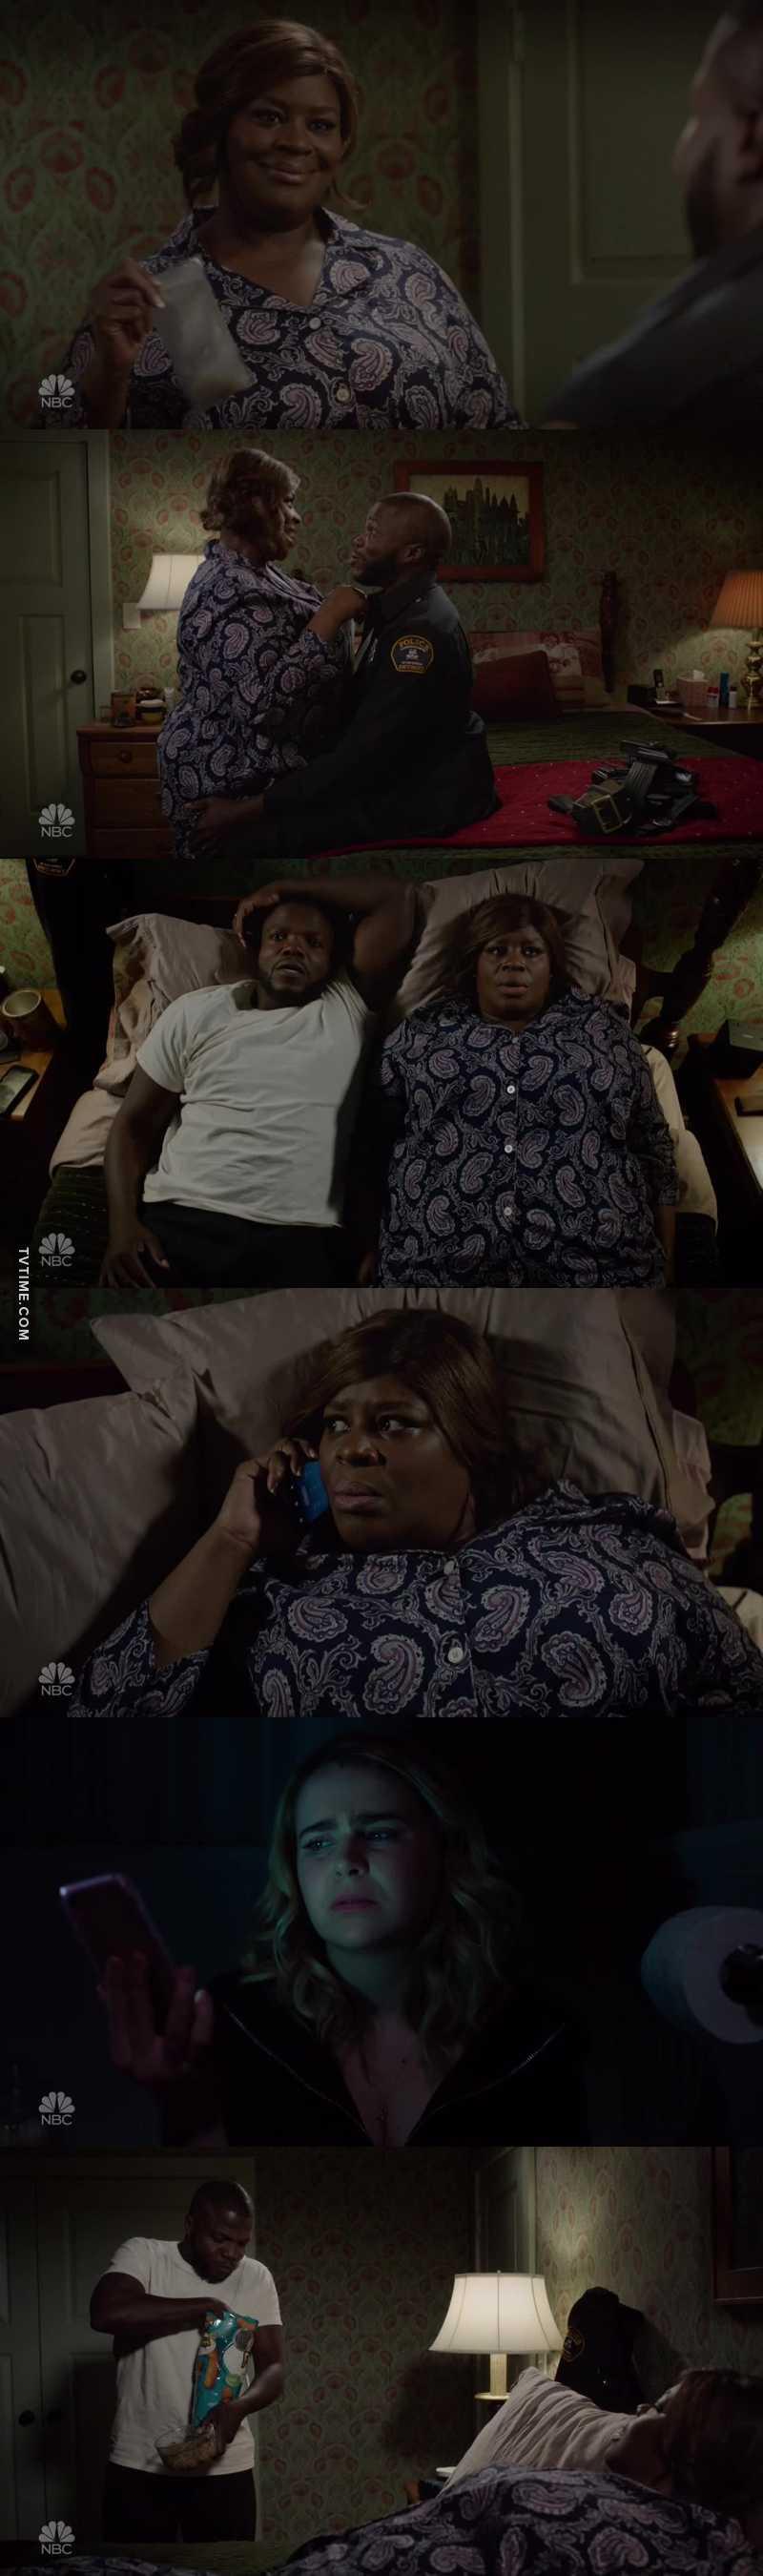 She got him high to interrogate him then she was so high she forgot how!! 😂😂😂 Ruby kills me.